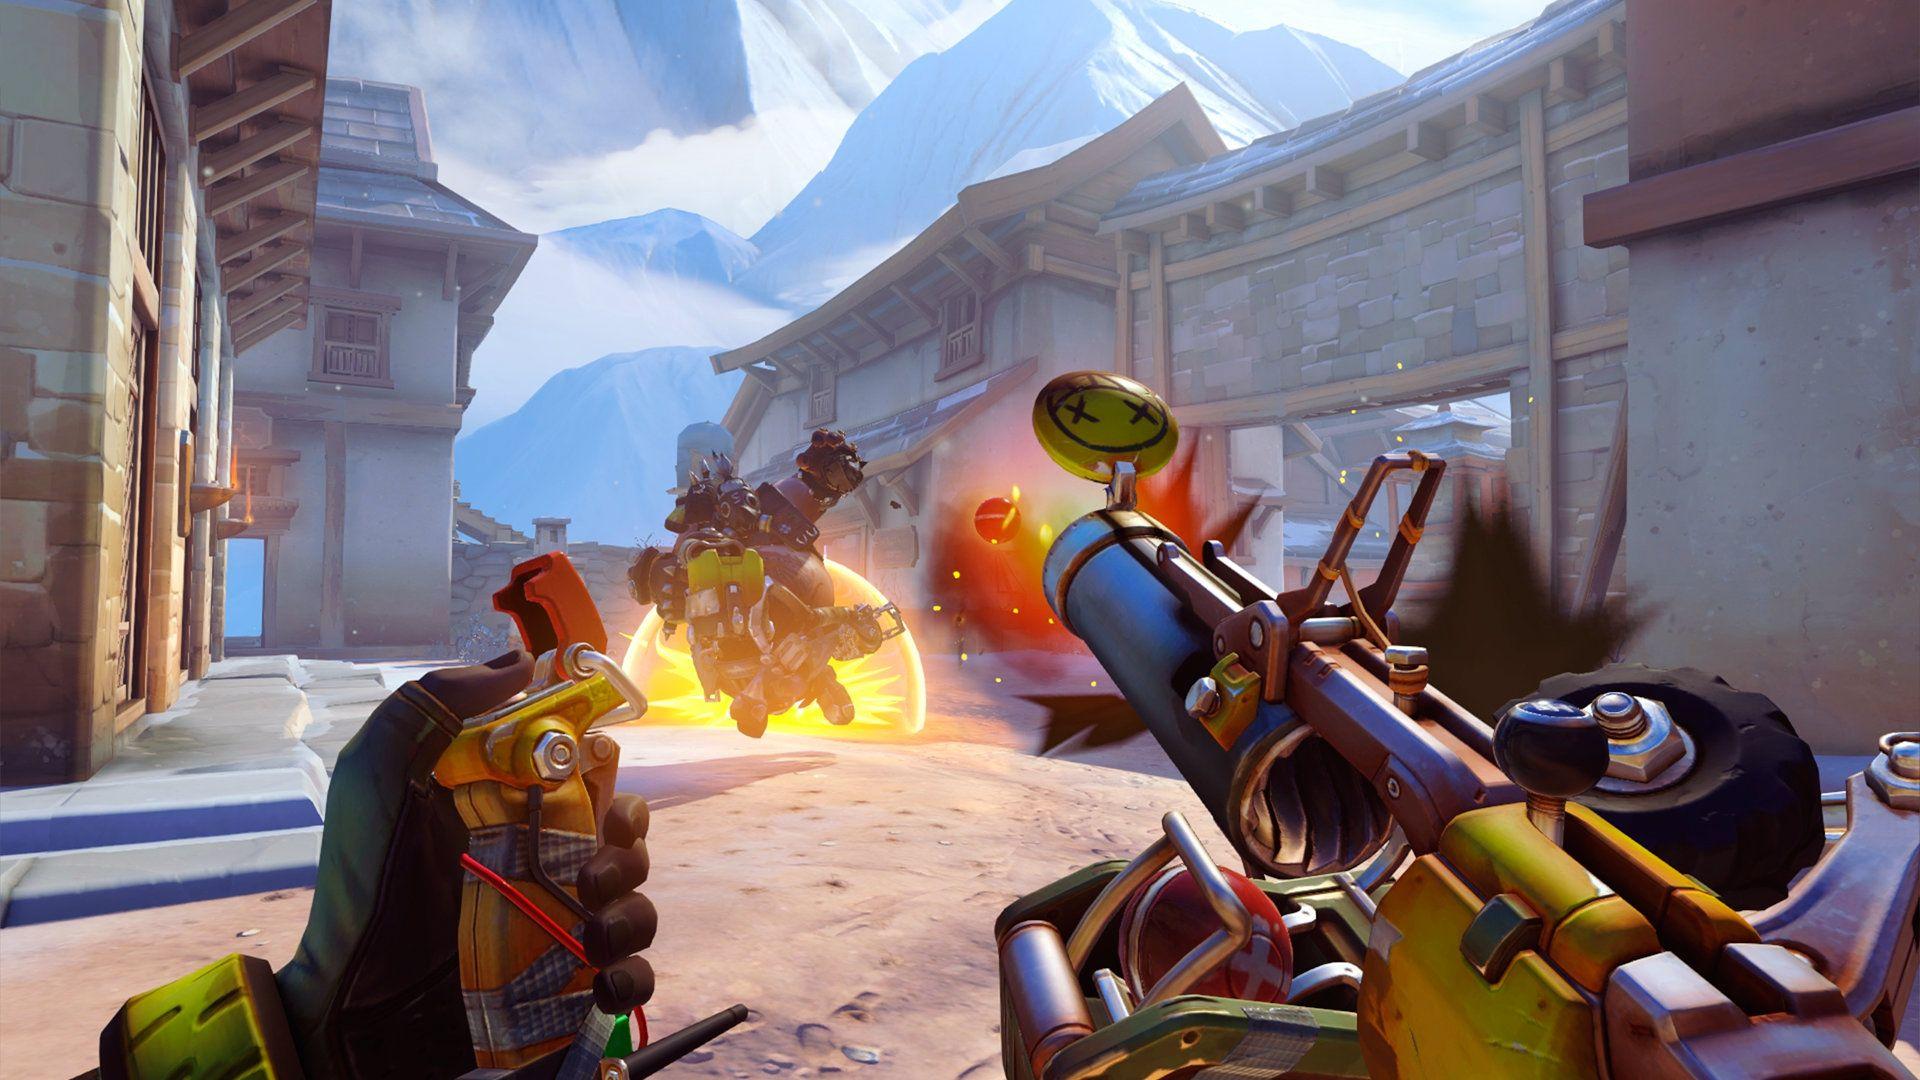 Overwatch Game Review Overwatch, Overwatch world